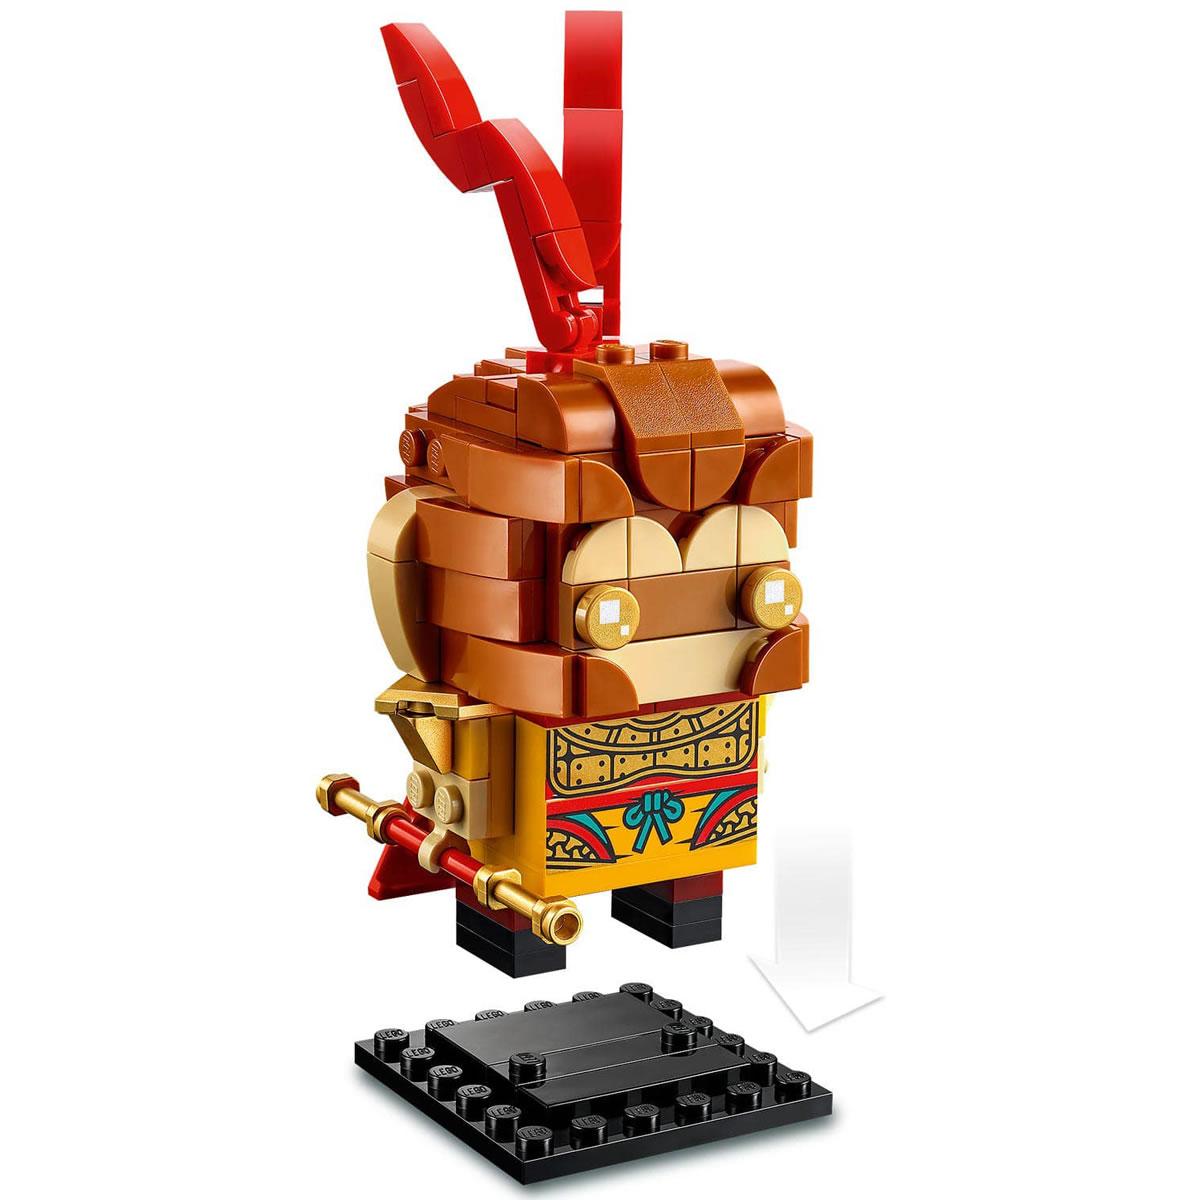 lego-40381-brickheadz-monkey-king-2020-1 zusammengebaut.com